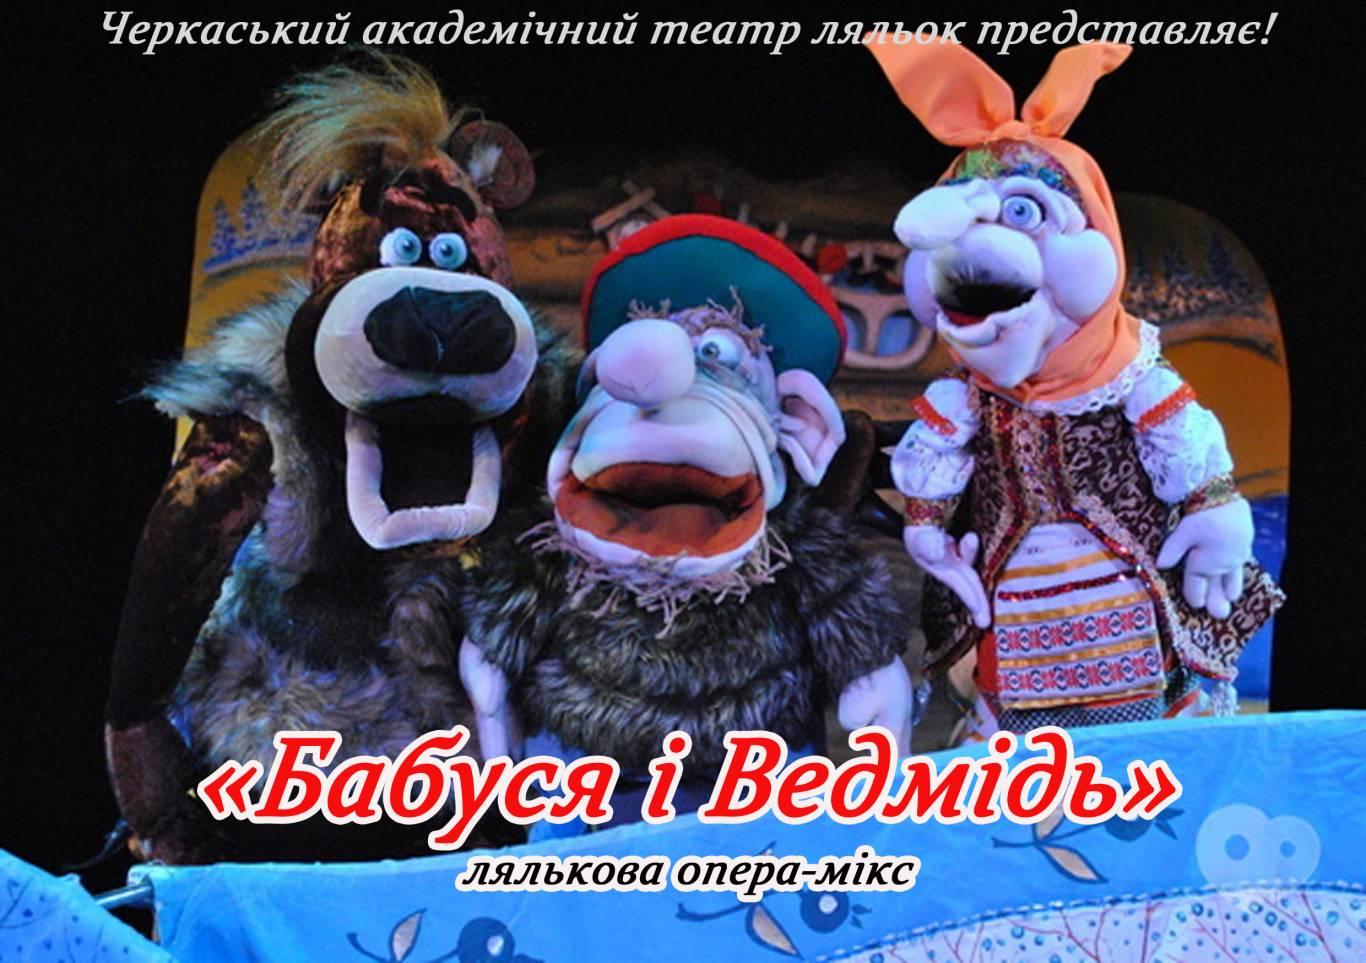 Лялькова опера-мікс«Бабуся і Ведмідь»